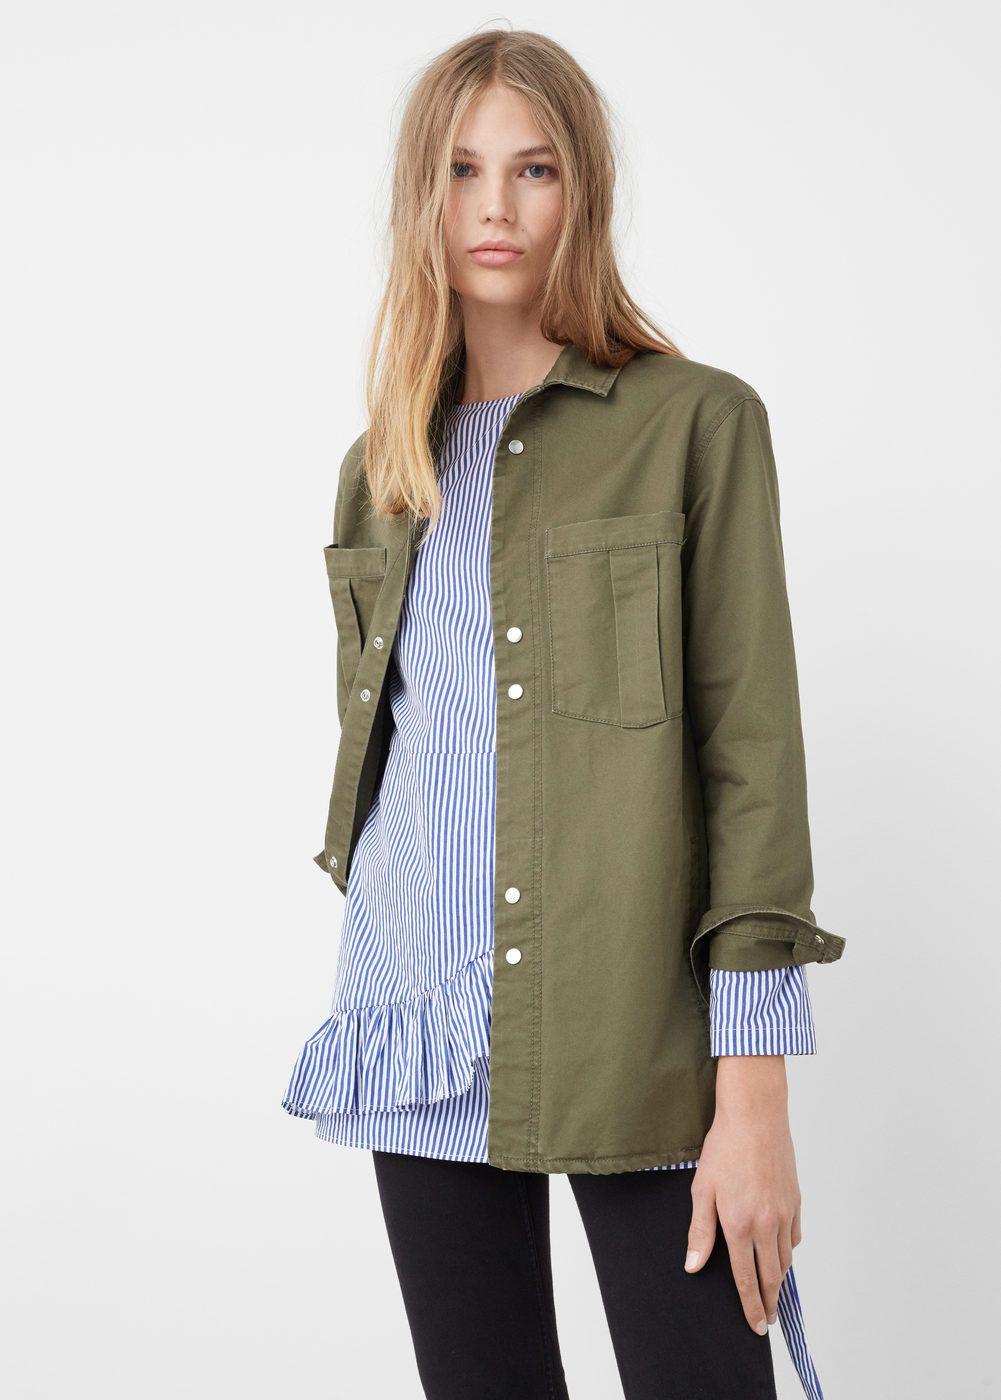 Chest-pocket cotton overshirt - Shirts for Women   MANGO USA